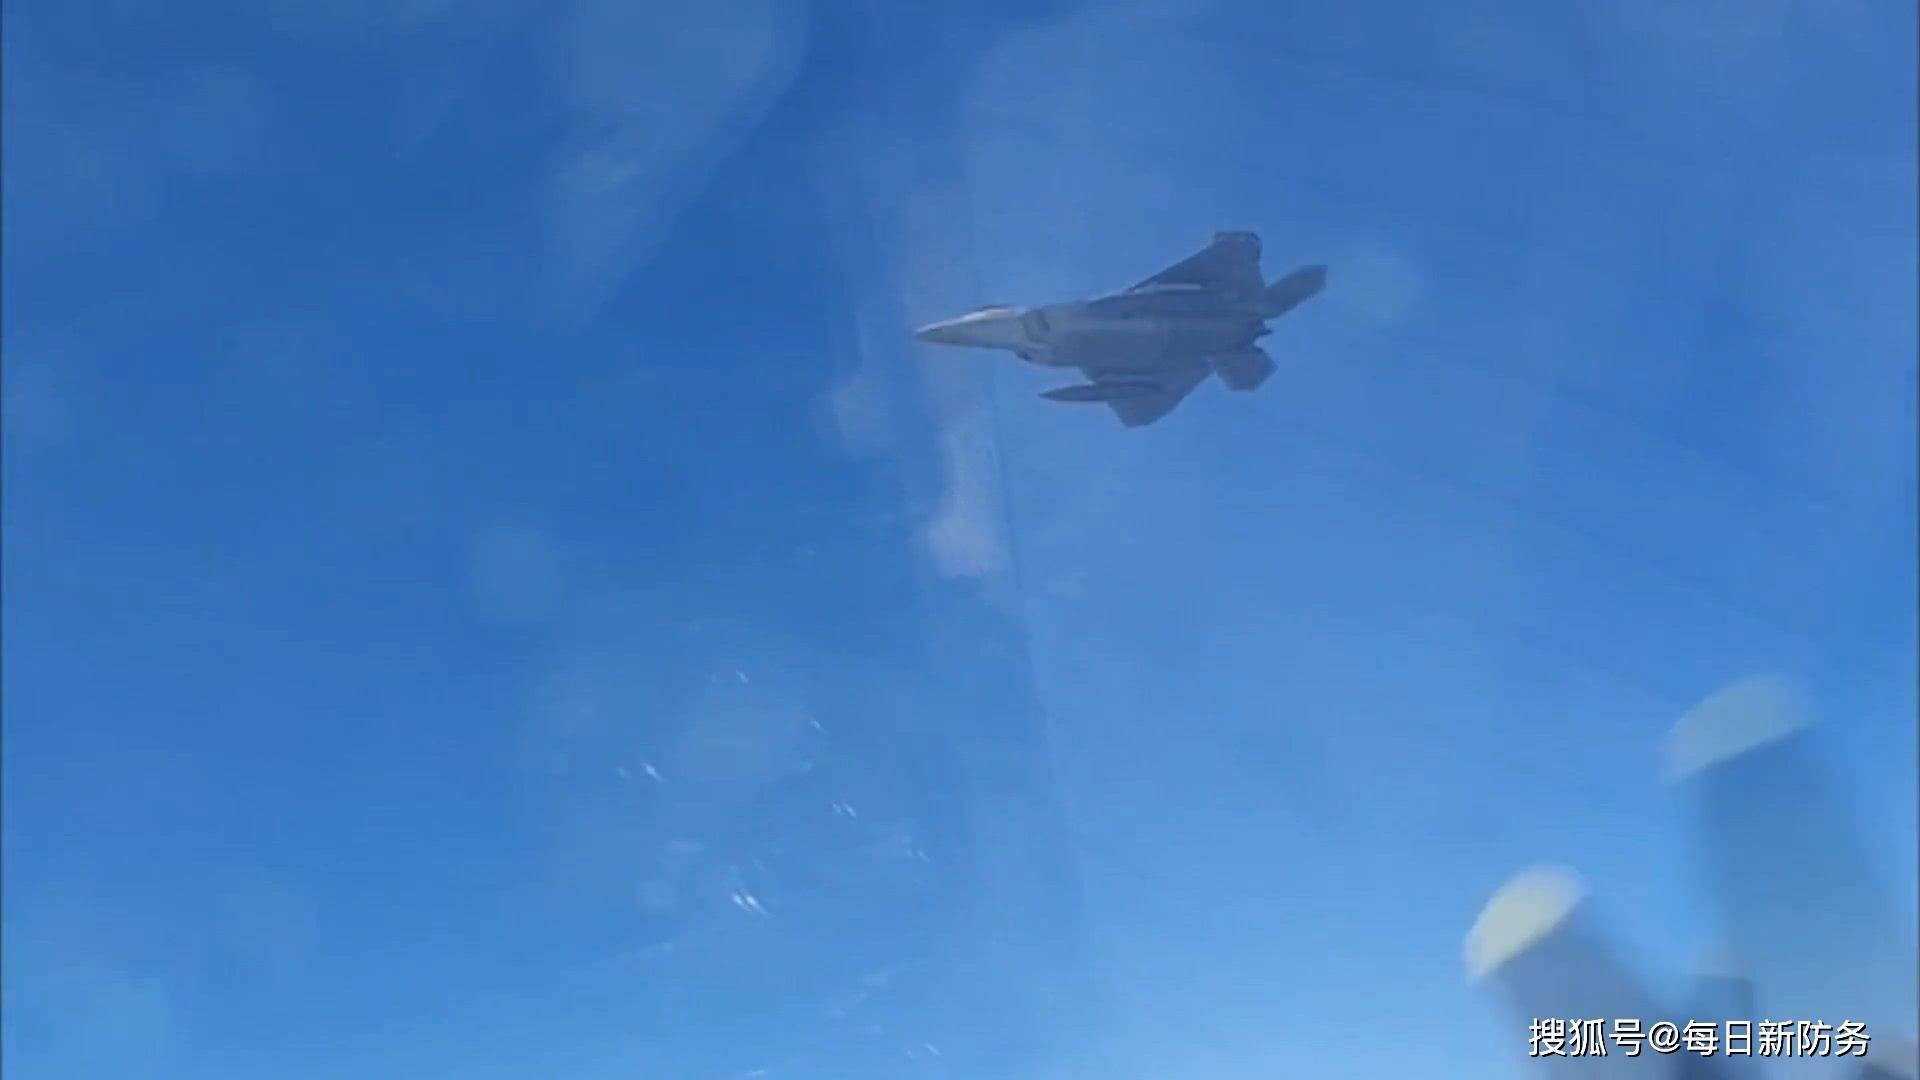 F-22惨遭米格-31戏耍,却无能无力,俄将美防空识别区当自家花园